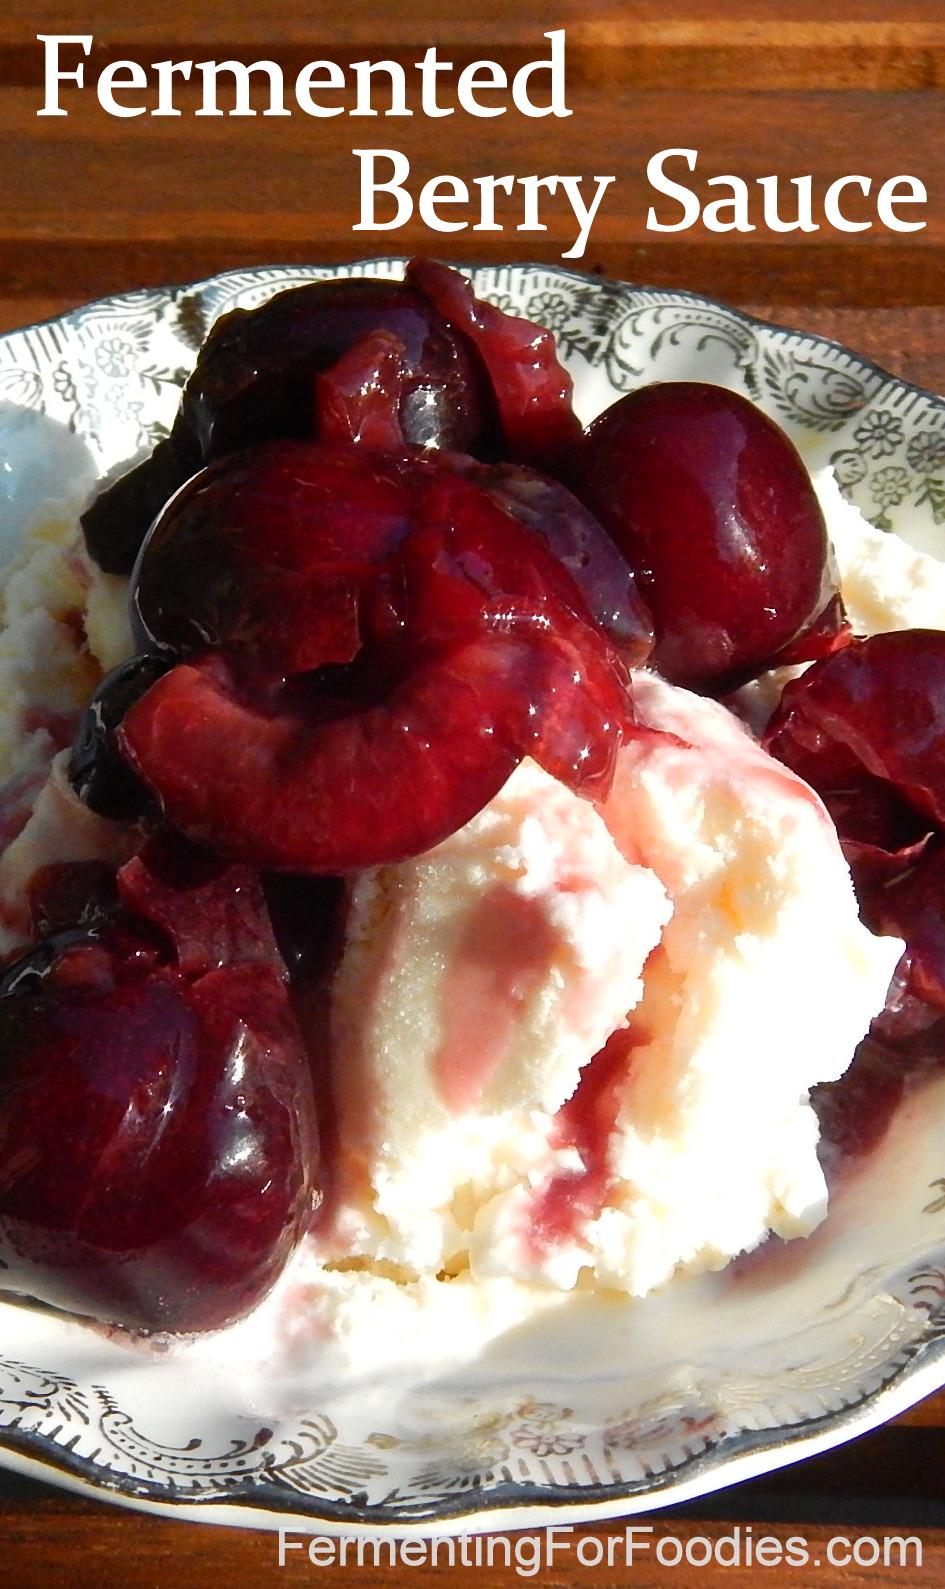 Fermented Berry Sauce on Kefir Ice Cream